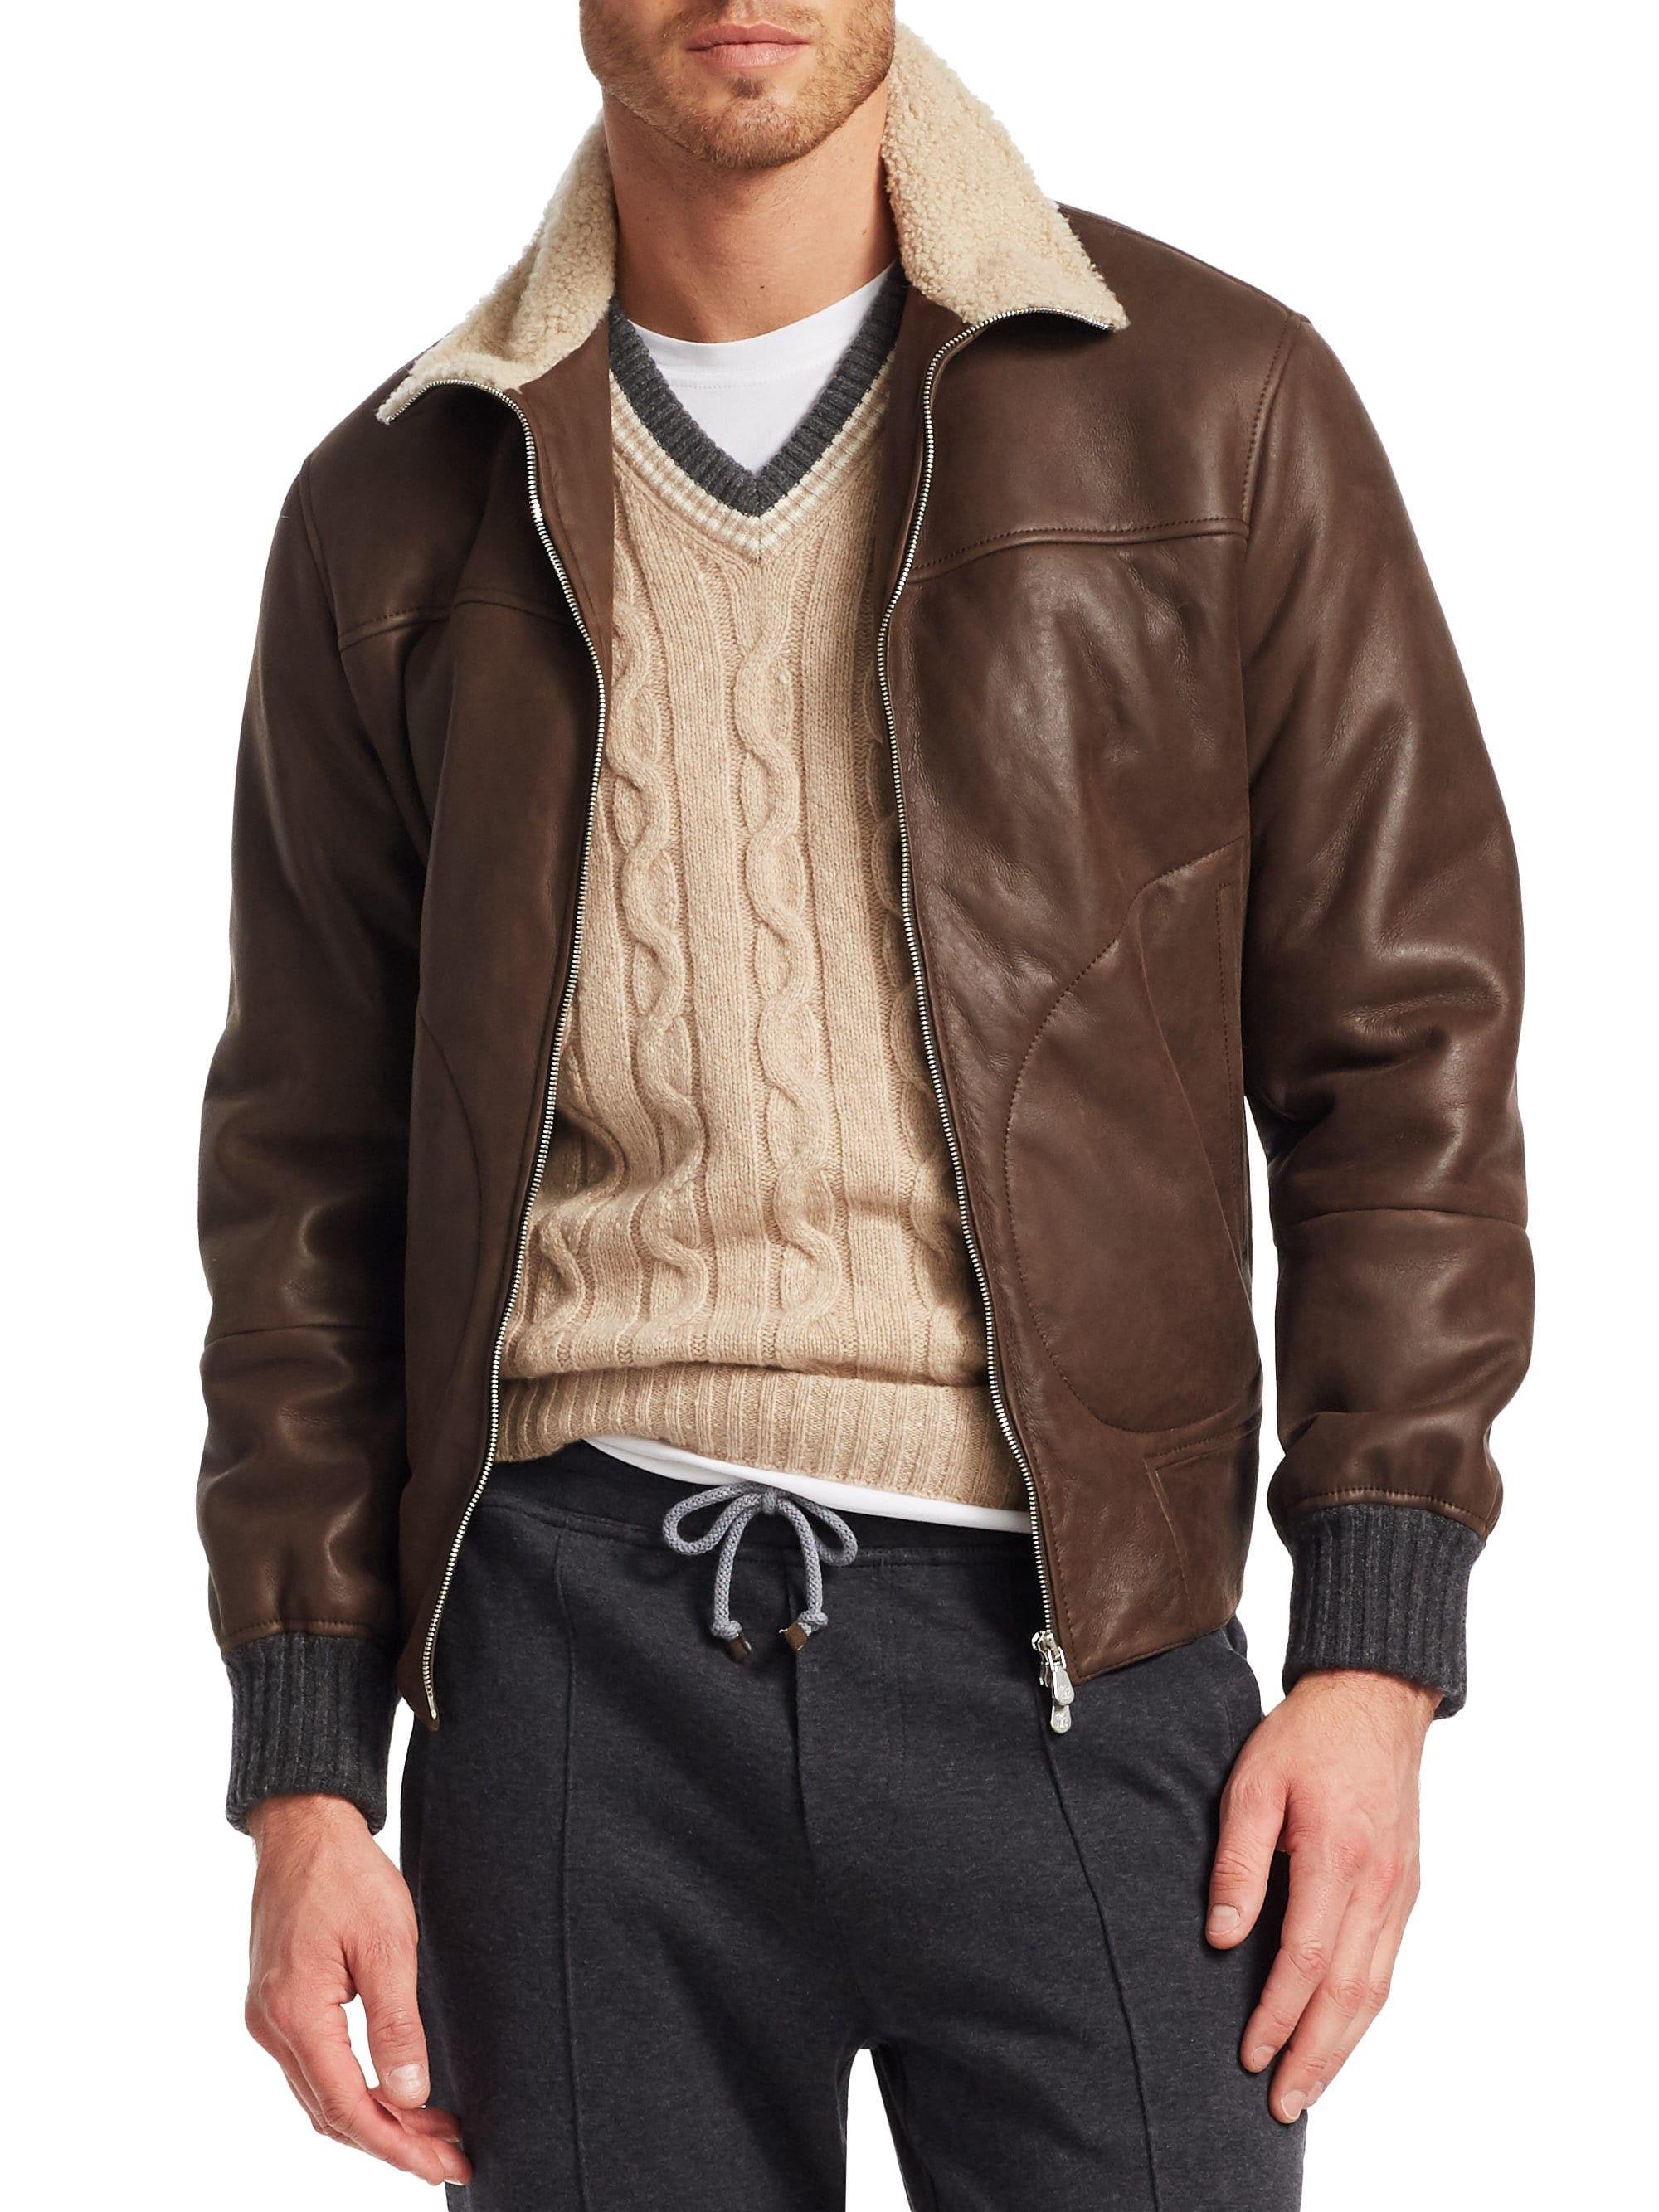 Brunello Cucinelli Leather Shearling Jacket Dark Brown Large Mens Shearling Bomber Jacket Leather Jacket Leather Jacket Men [ 2667 x 2000 Pixel ]